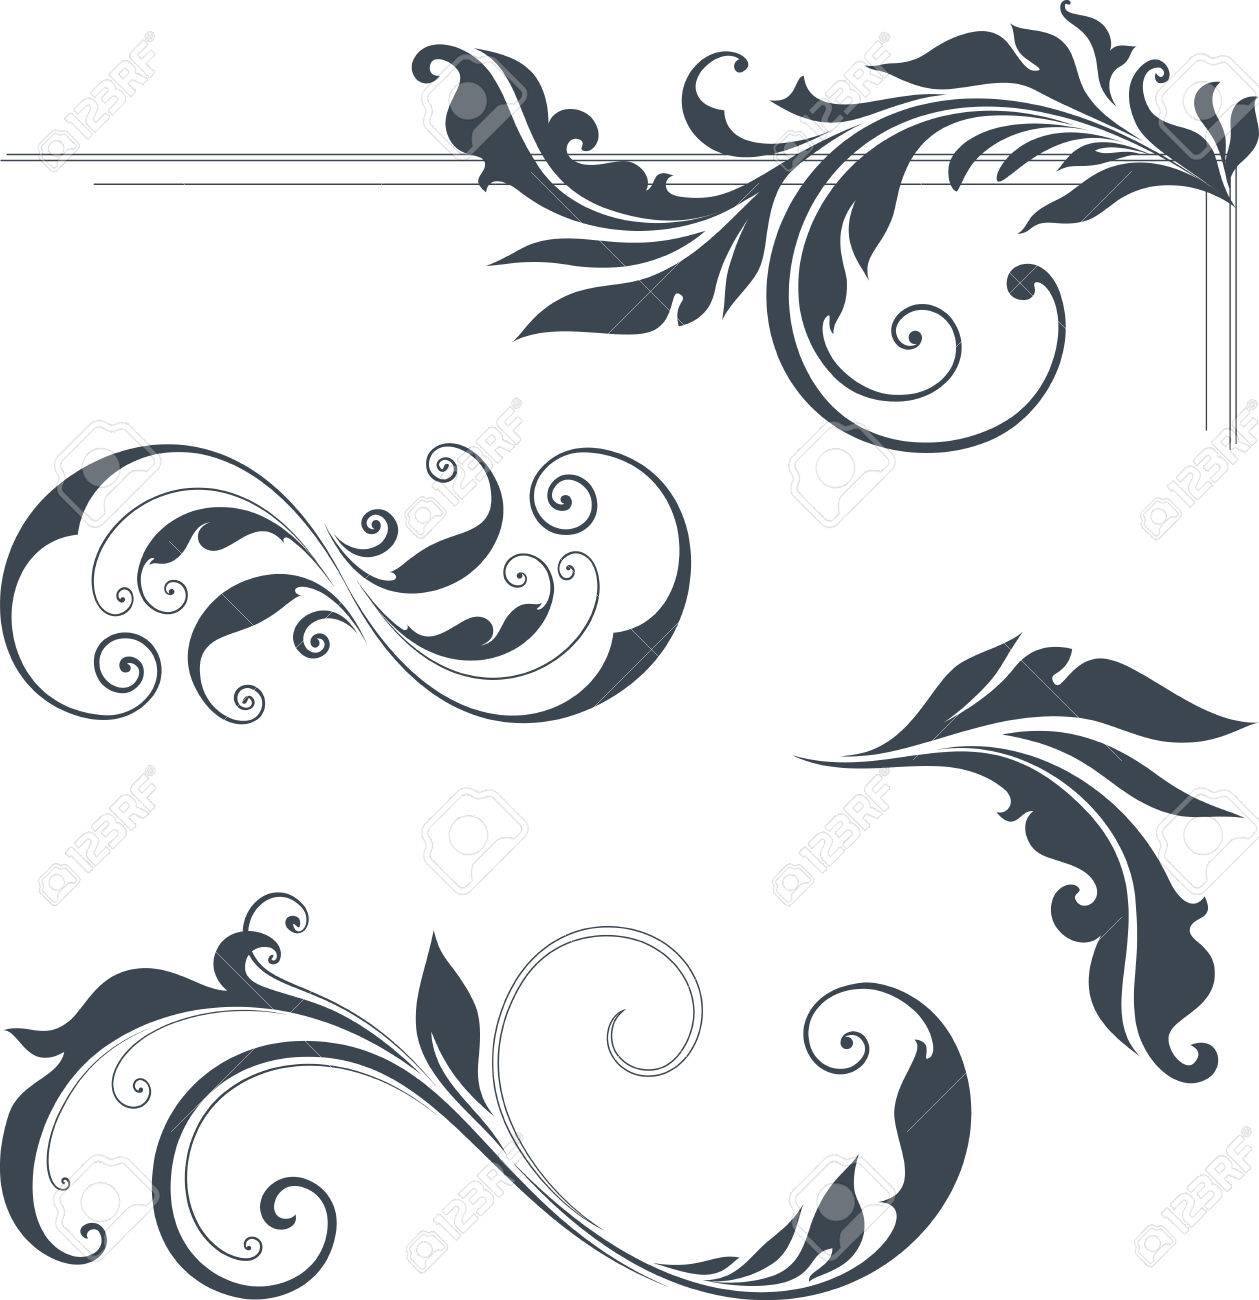 Vector swirl ornate motifs use for wedding invitations royal vector swirl ornate motifs use for wedding invitations royal certificates greeting cards stopboris Choice Image